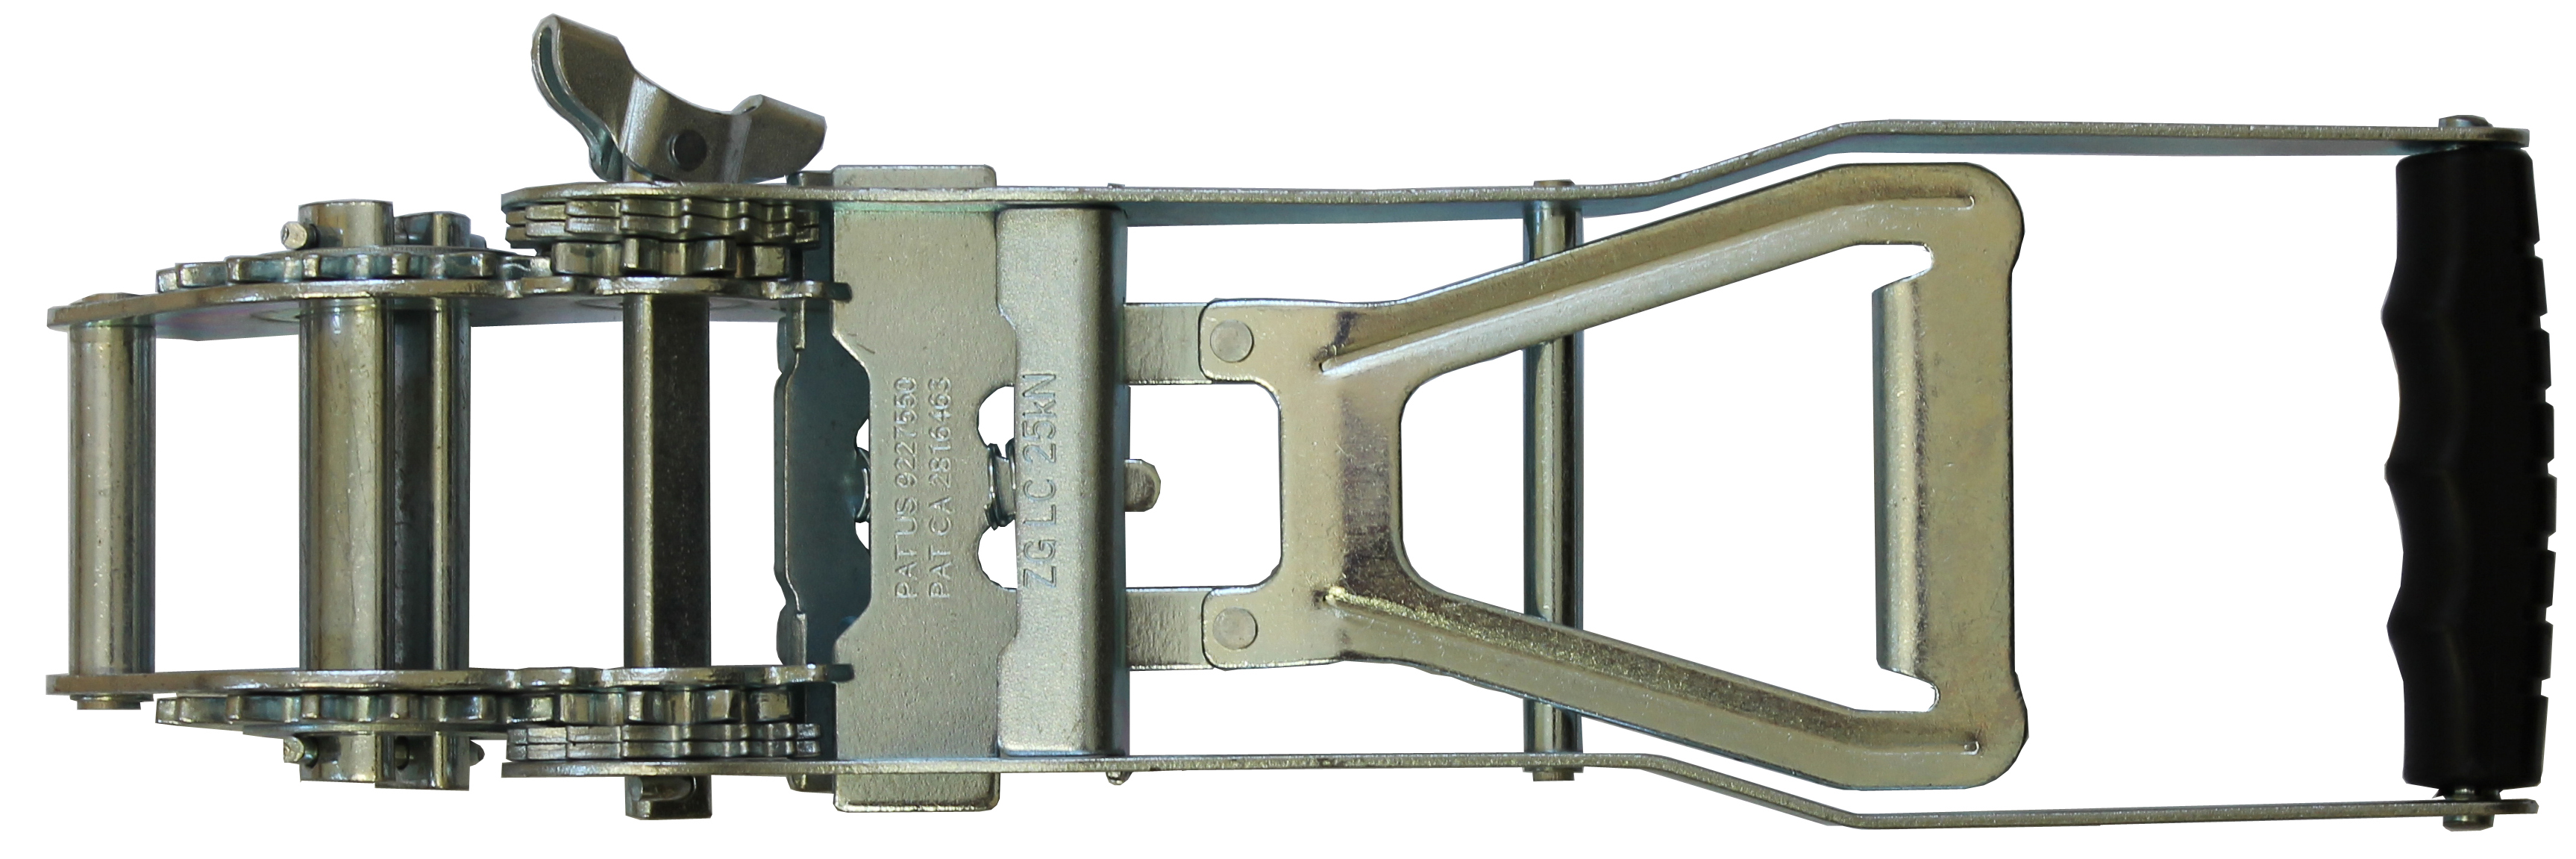 Langhebelzugratsche Ergo MAX 50 mm